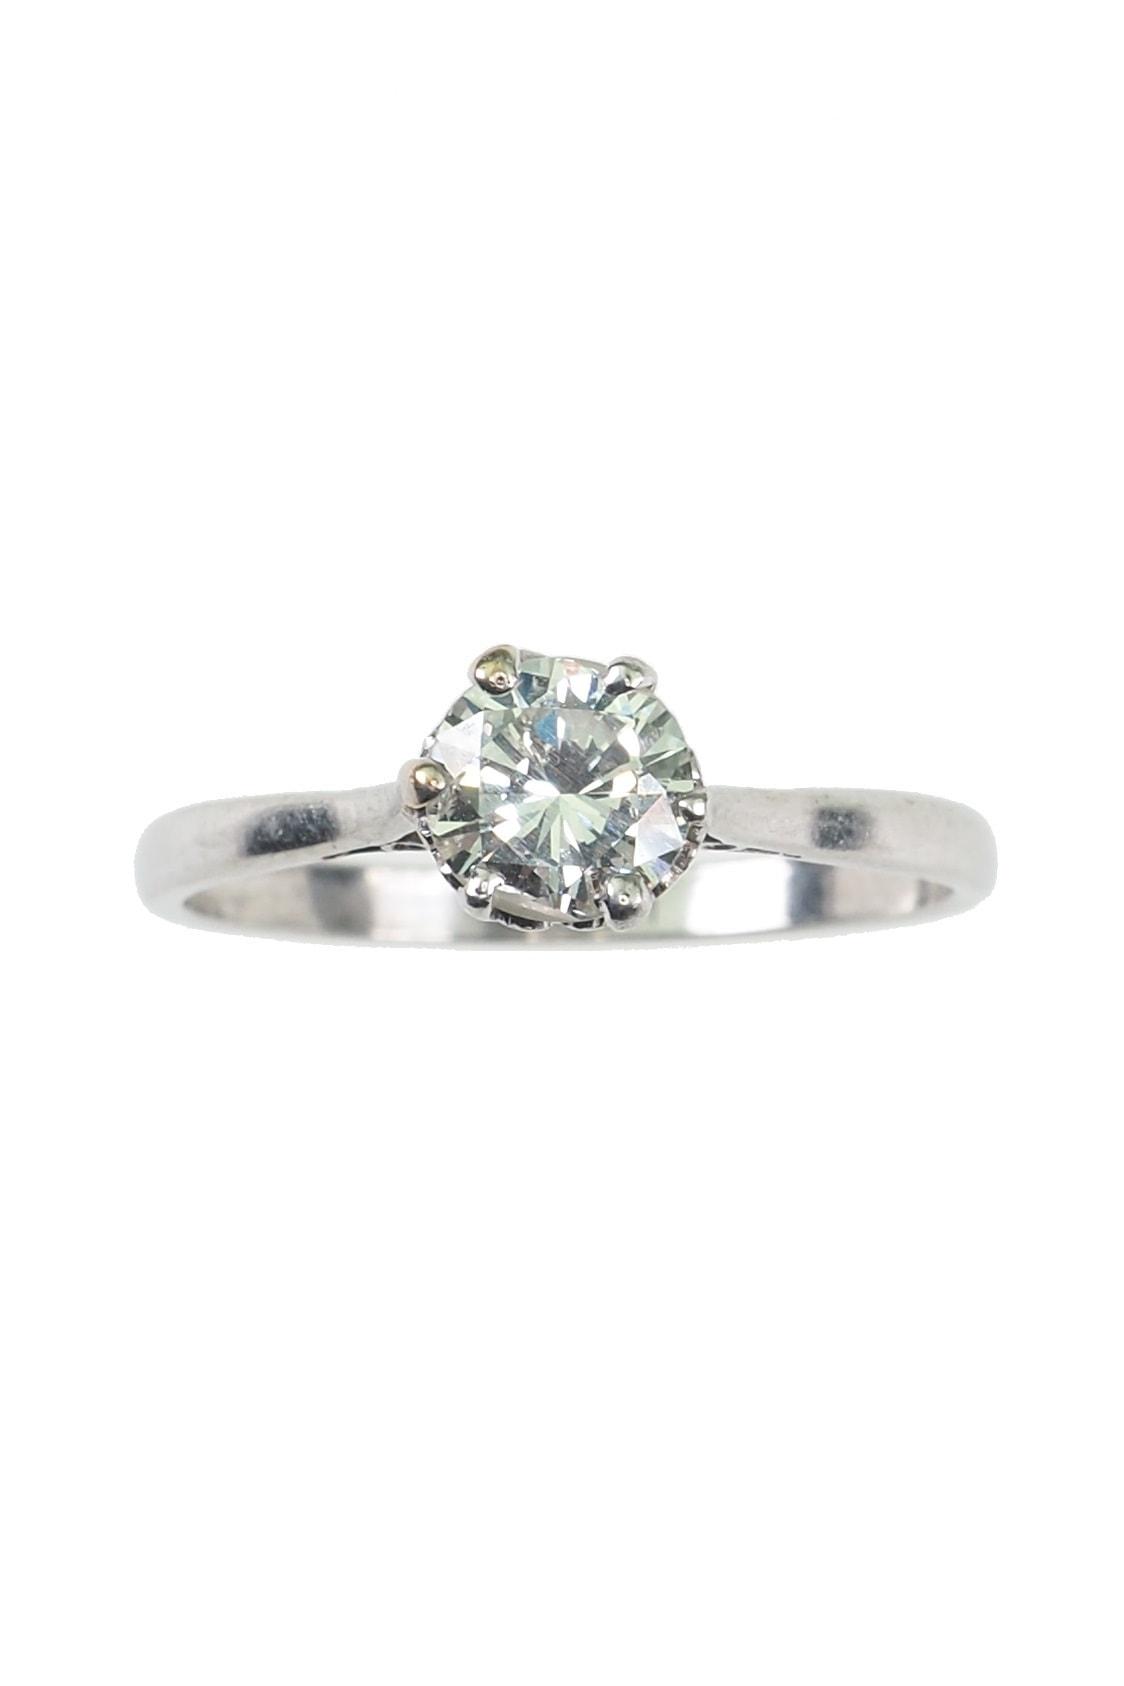 zertifizierten-Diamantschmuck-kaufen-0215